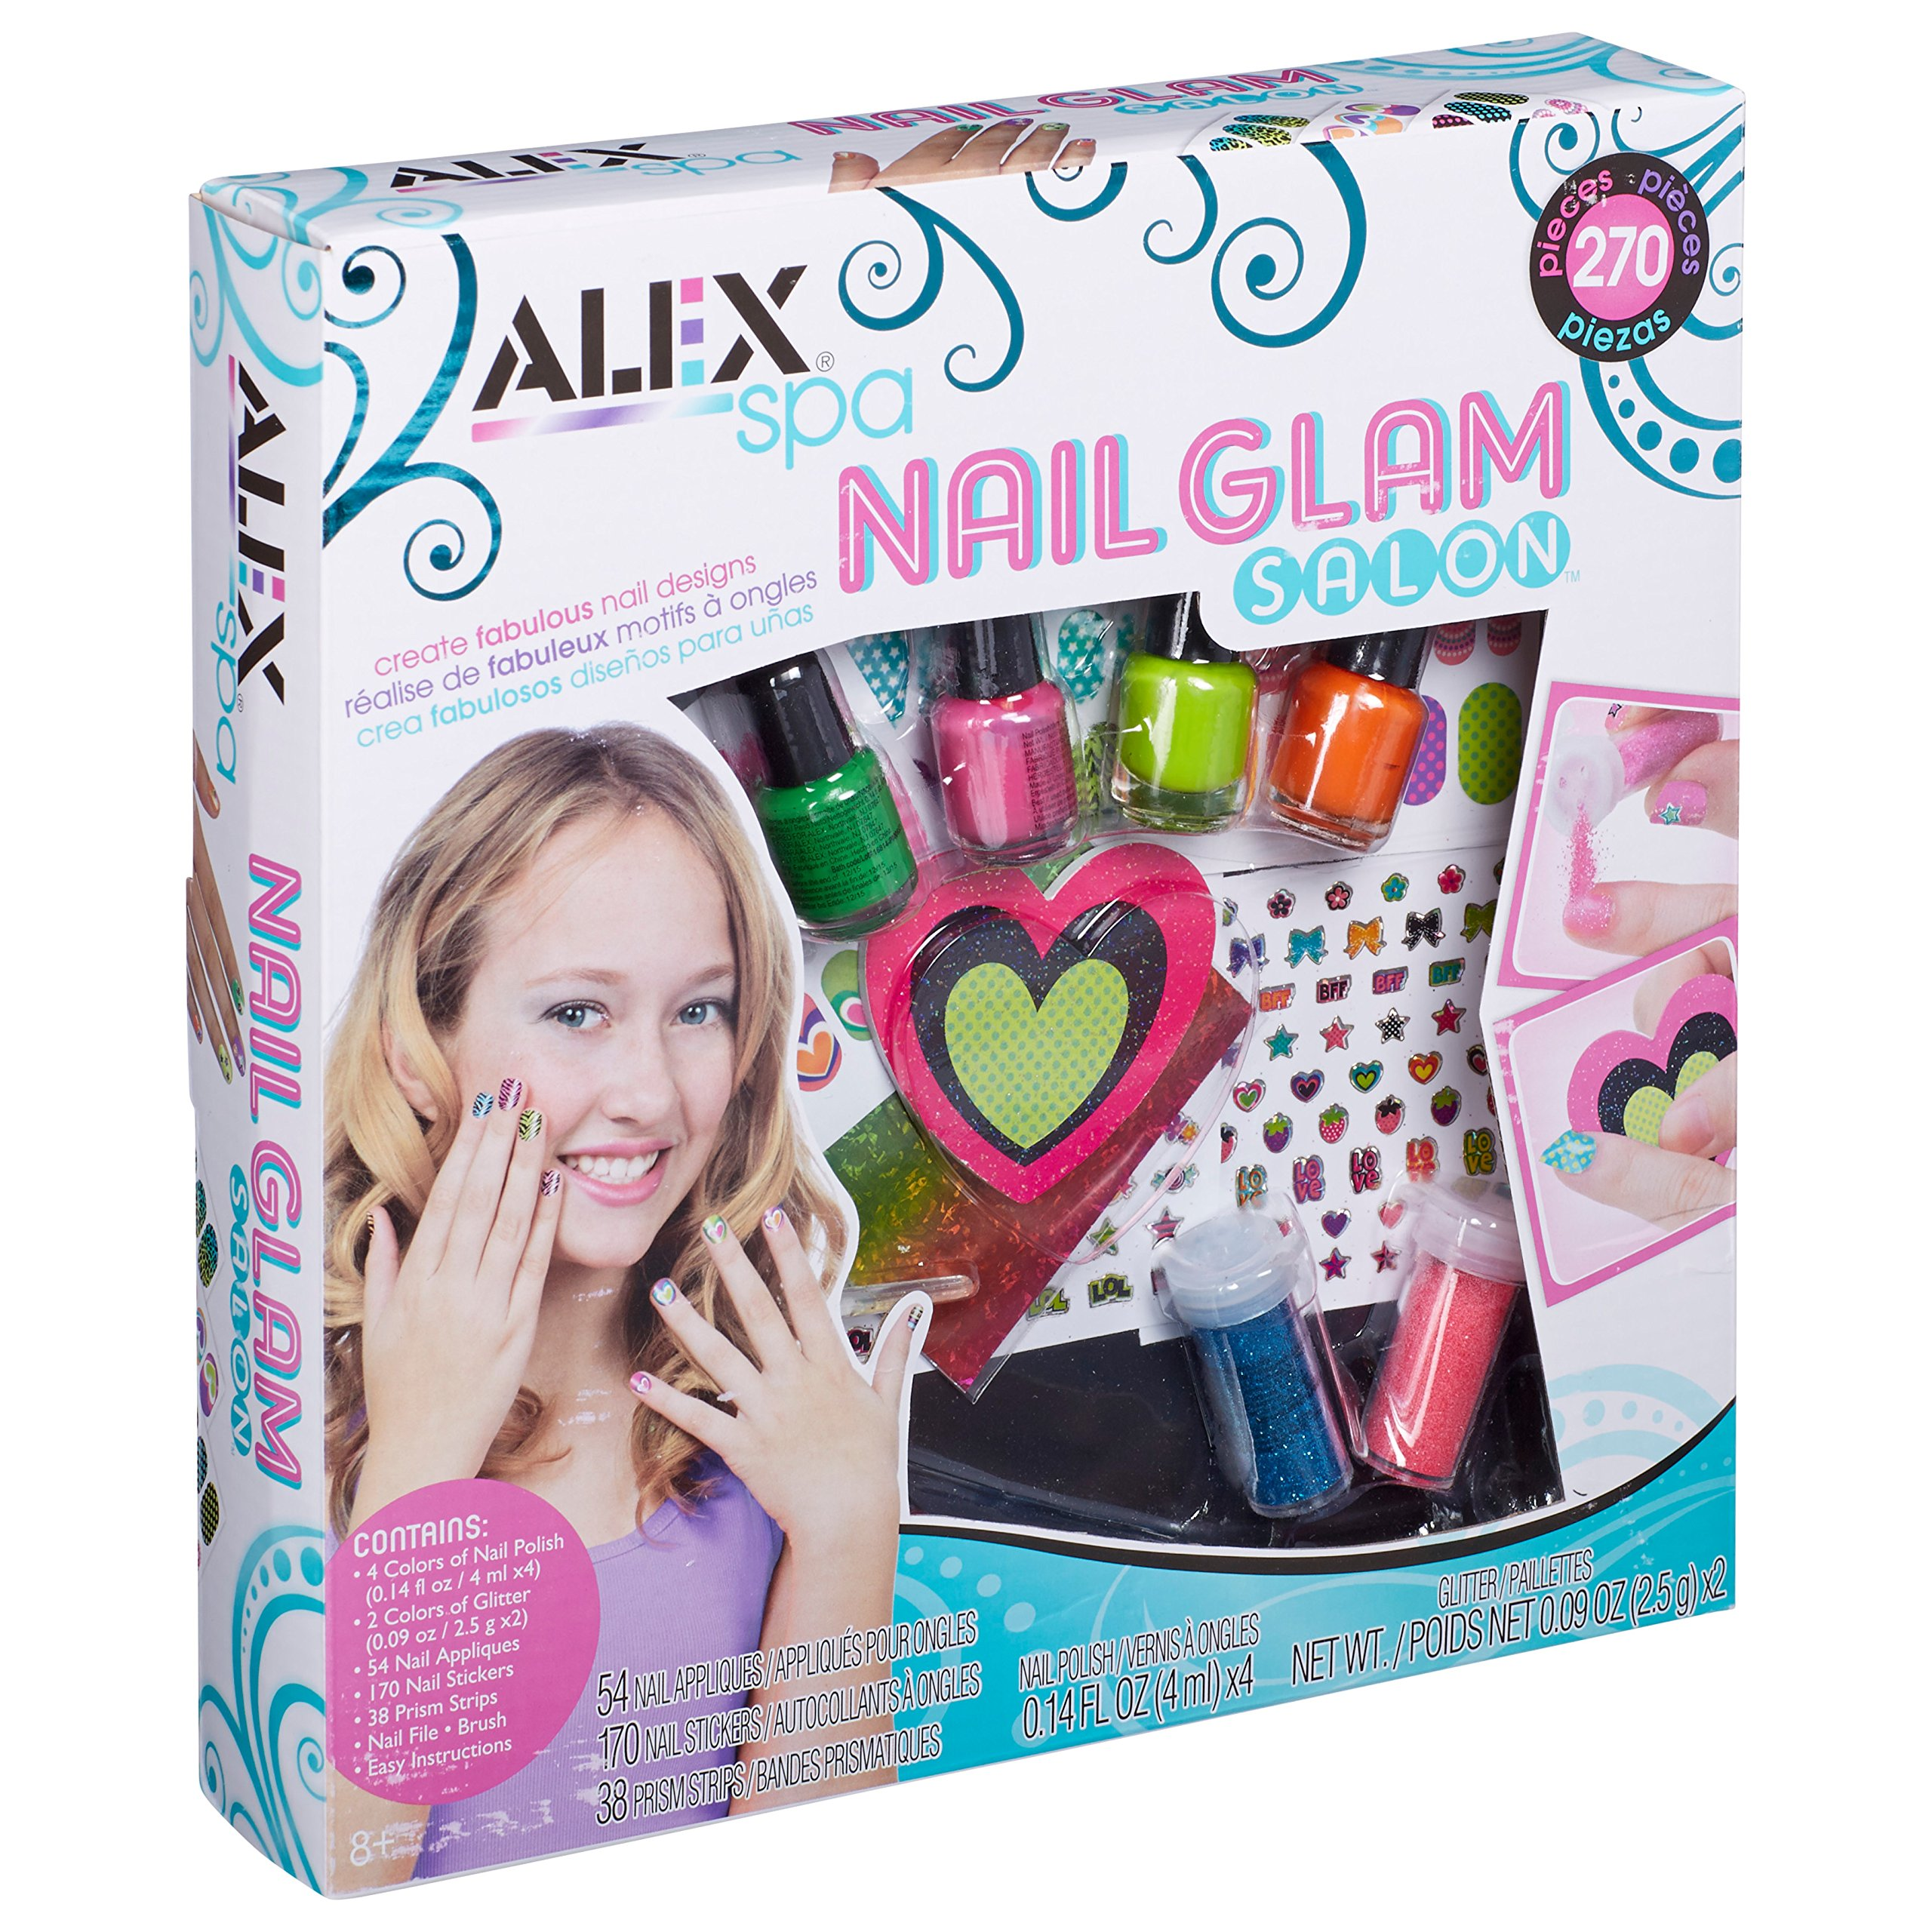 ALEX Spa Nail Glam Salon